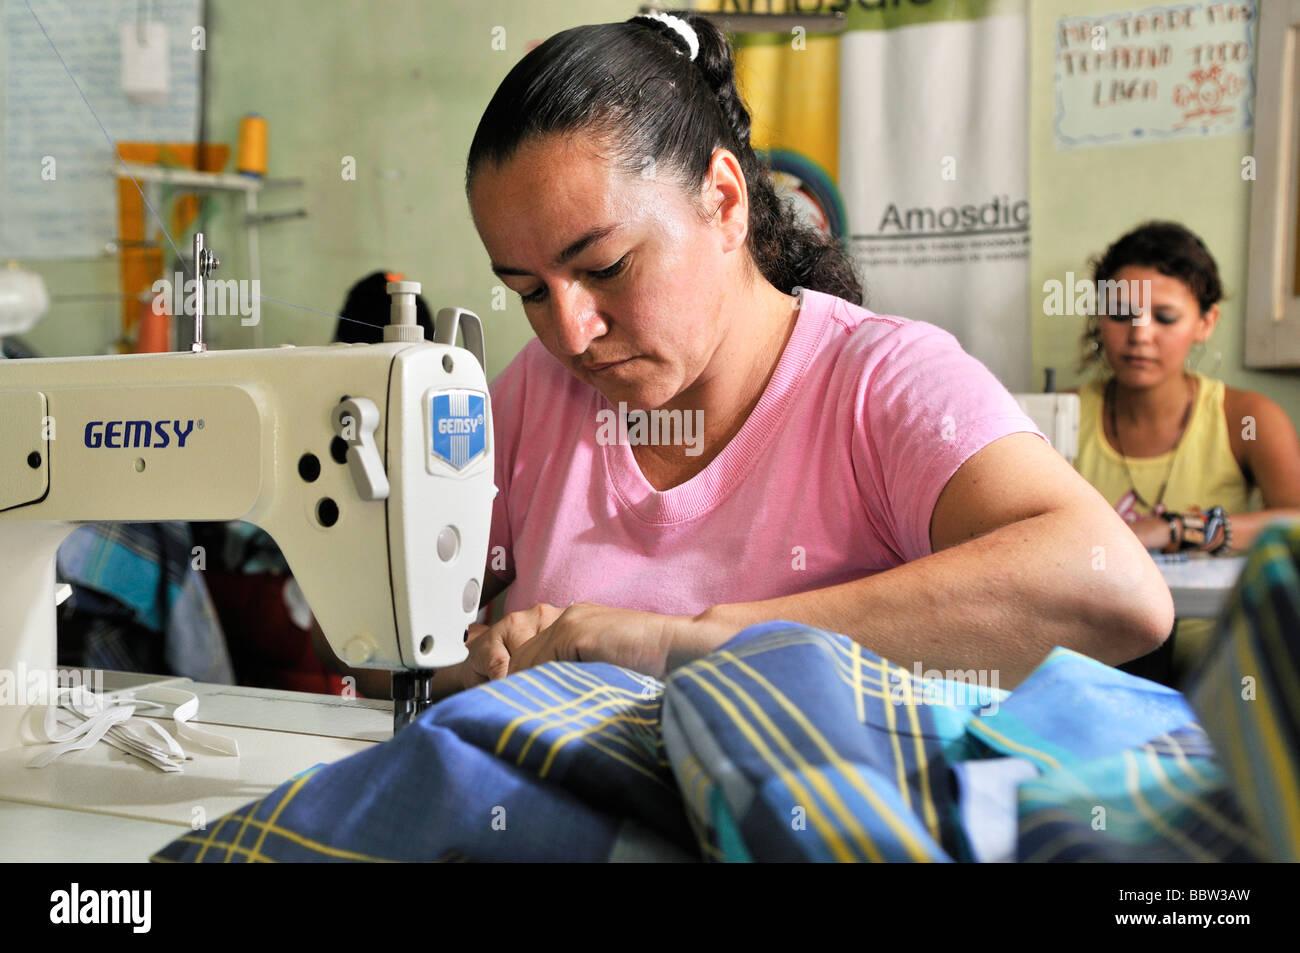 Women using sewing machines, Seamstress Cooperative in La Dorada, Colombia, South America - Stock Image